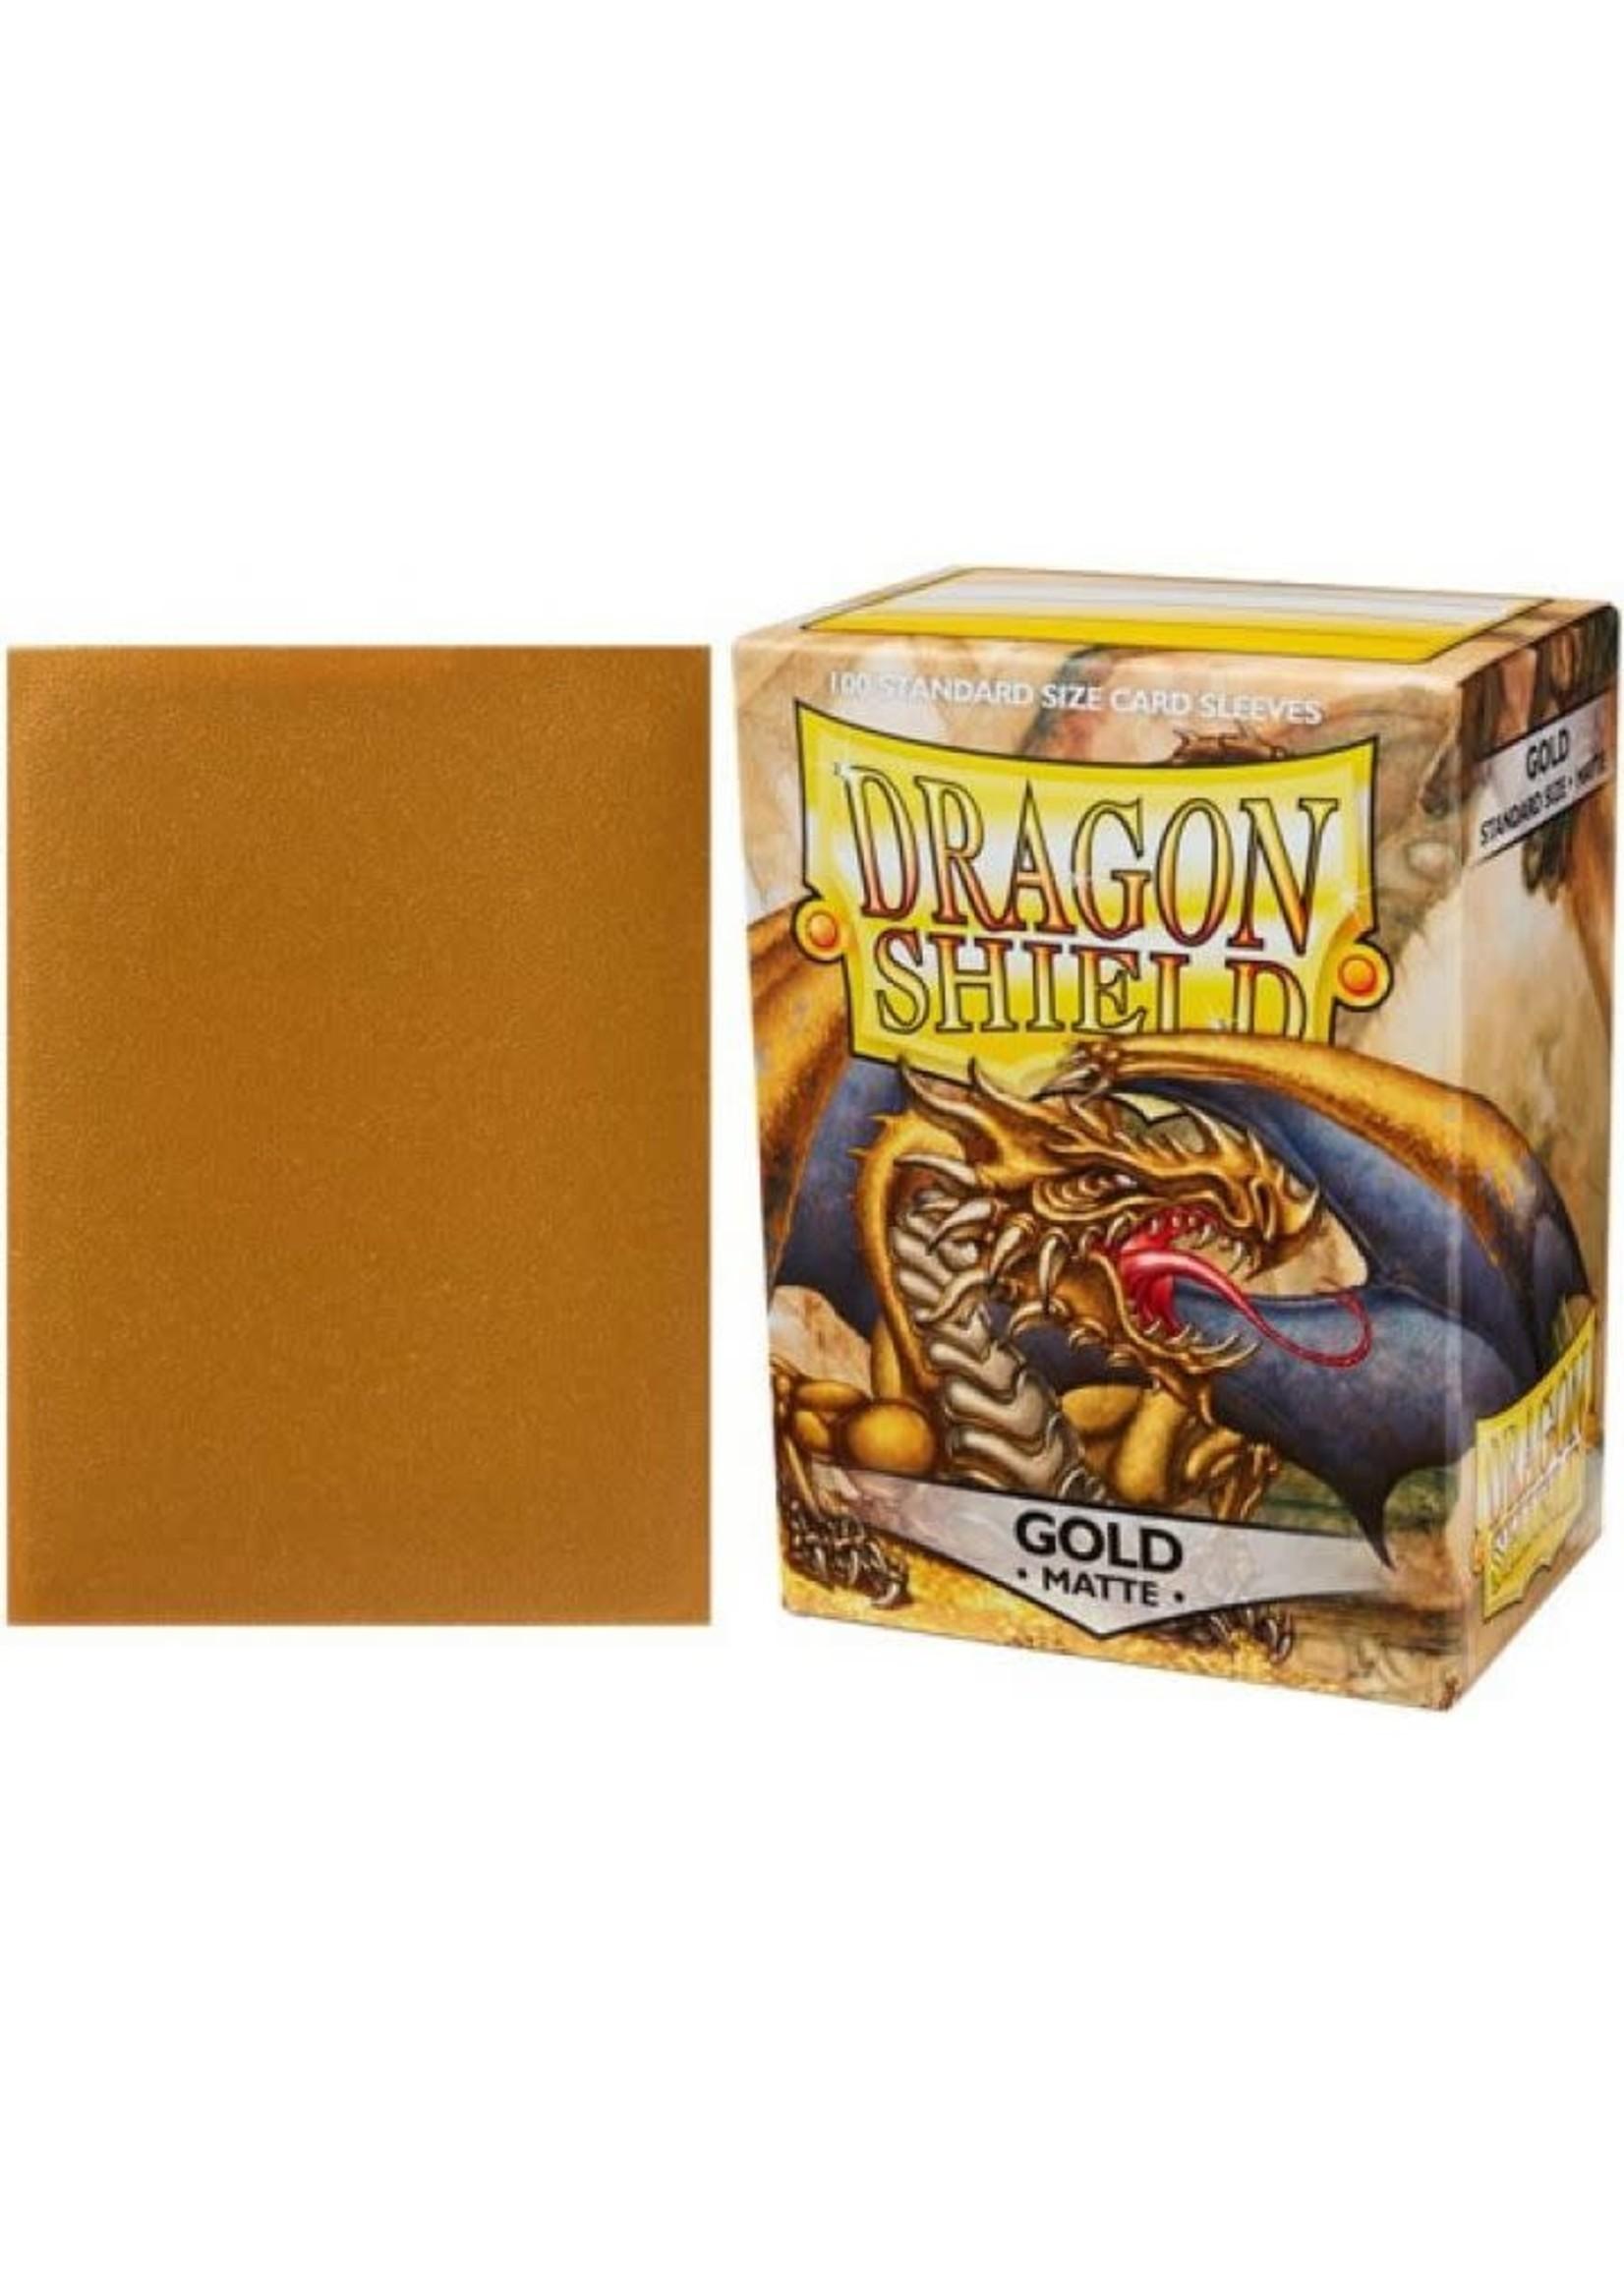 Dragonshield Matte Gold